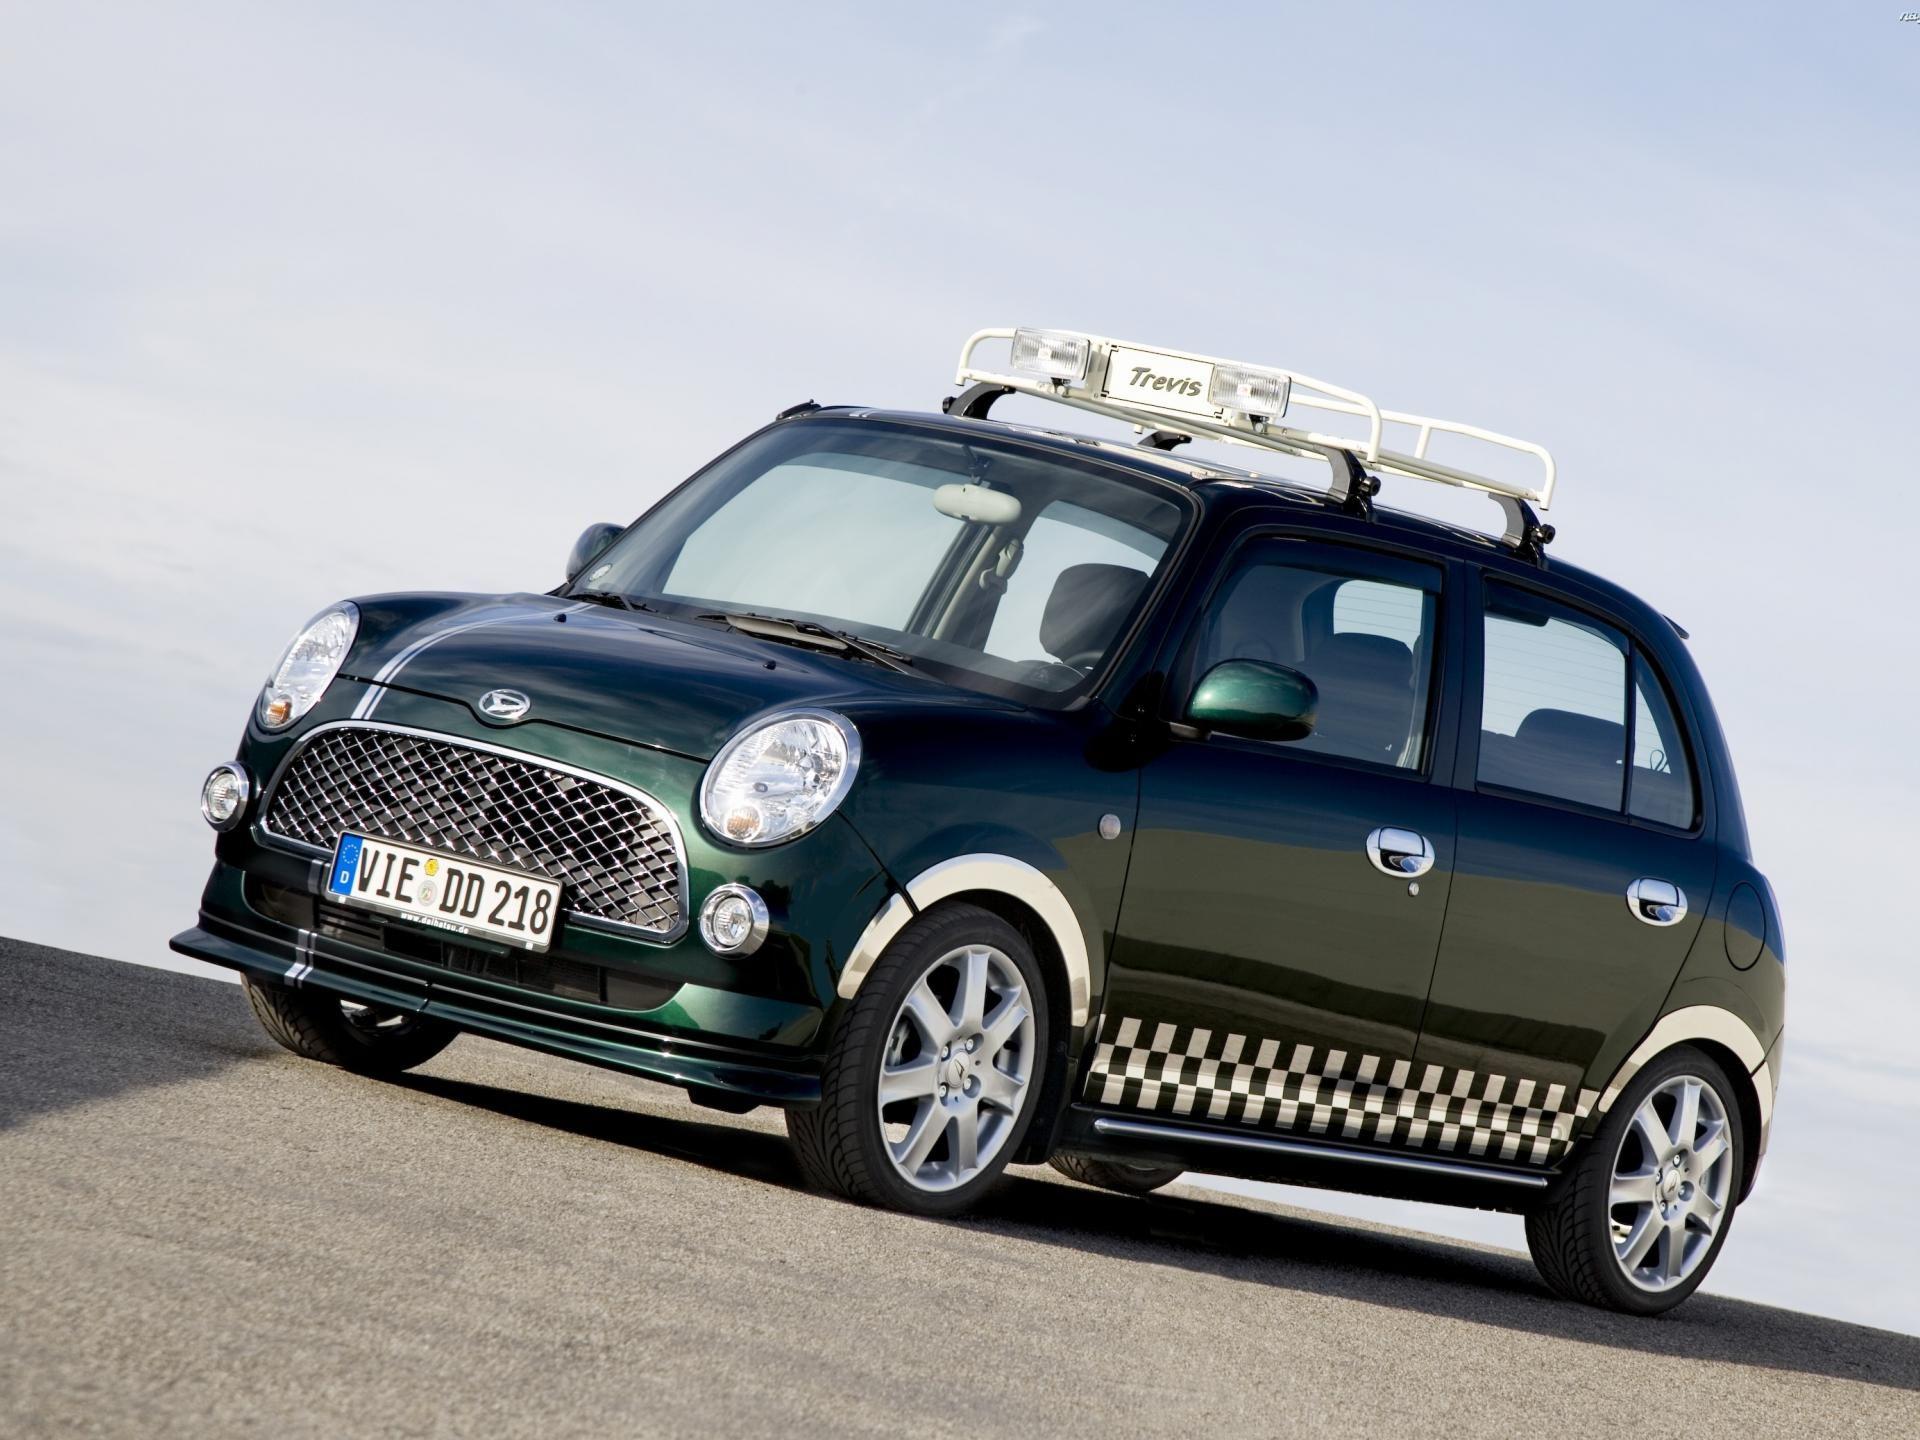 Daihatsu おしゃれまとめの人気アイデア Pinterest Sander Van Dijk かわいい車 コンパクトカー 車